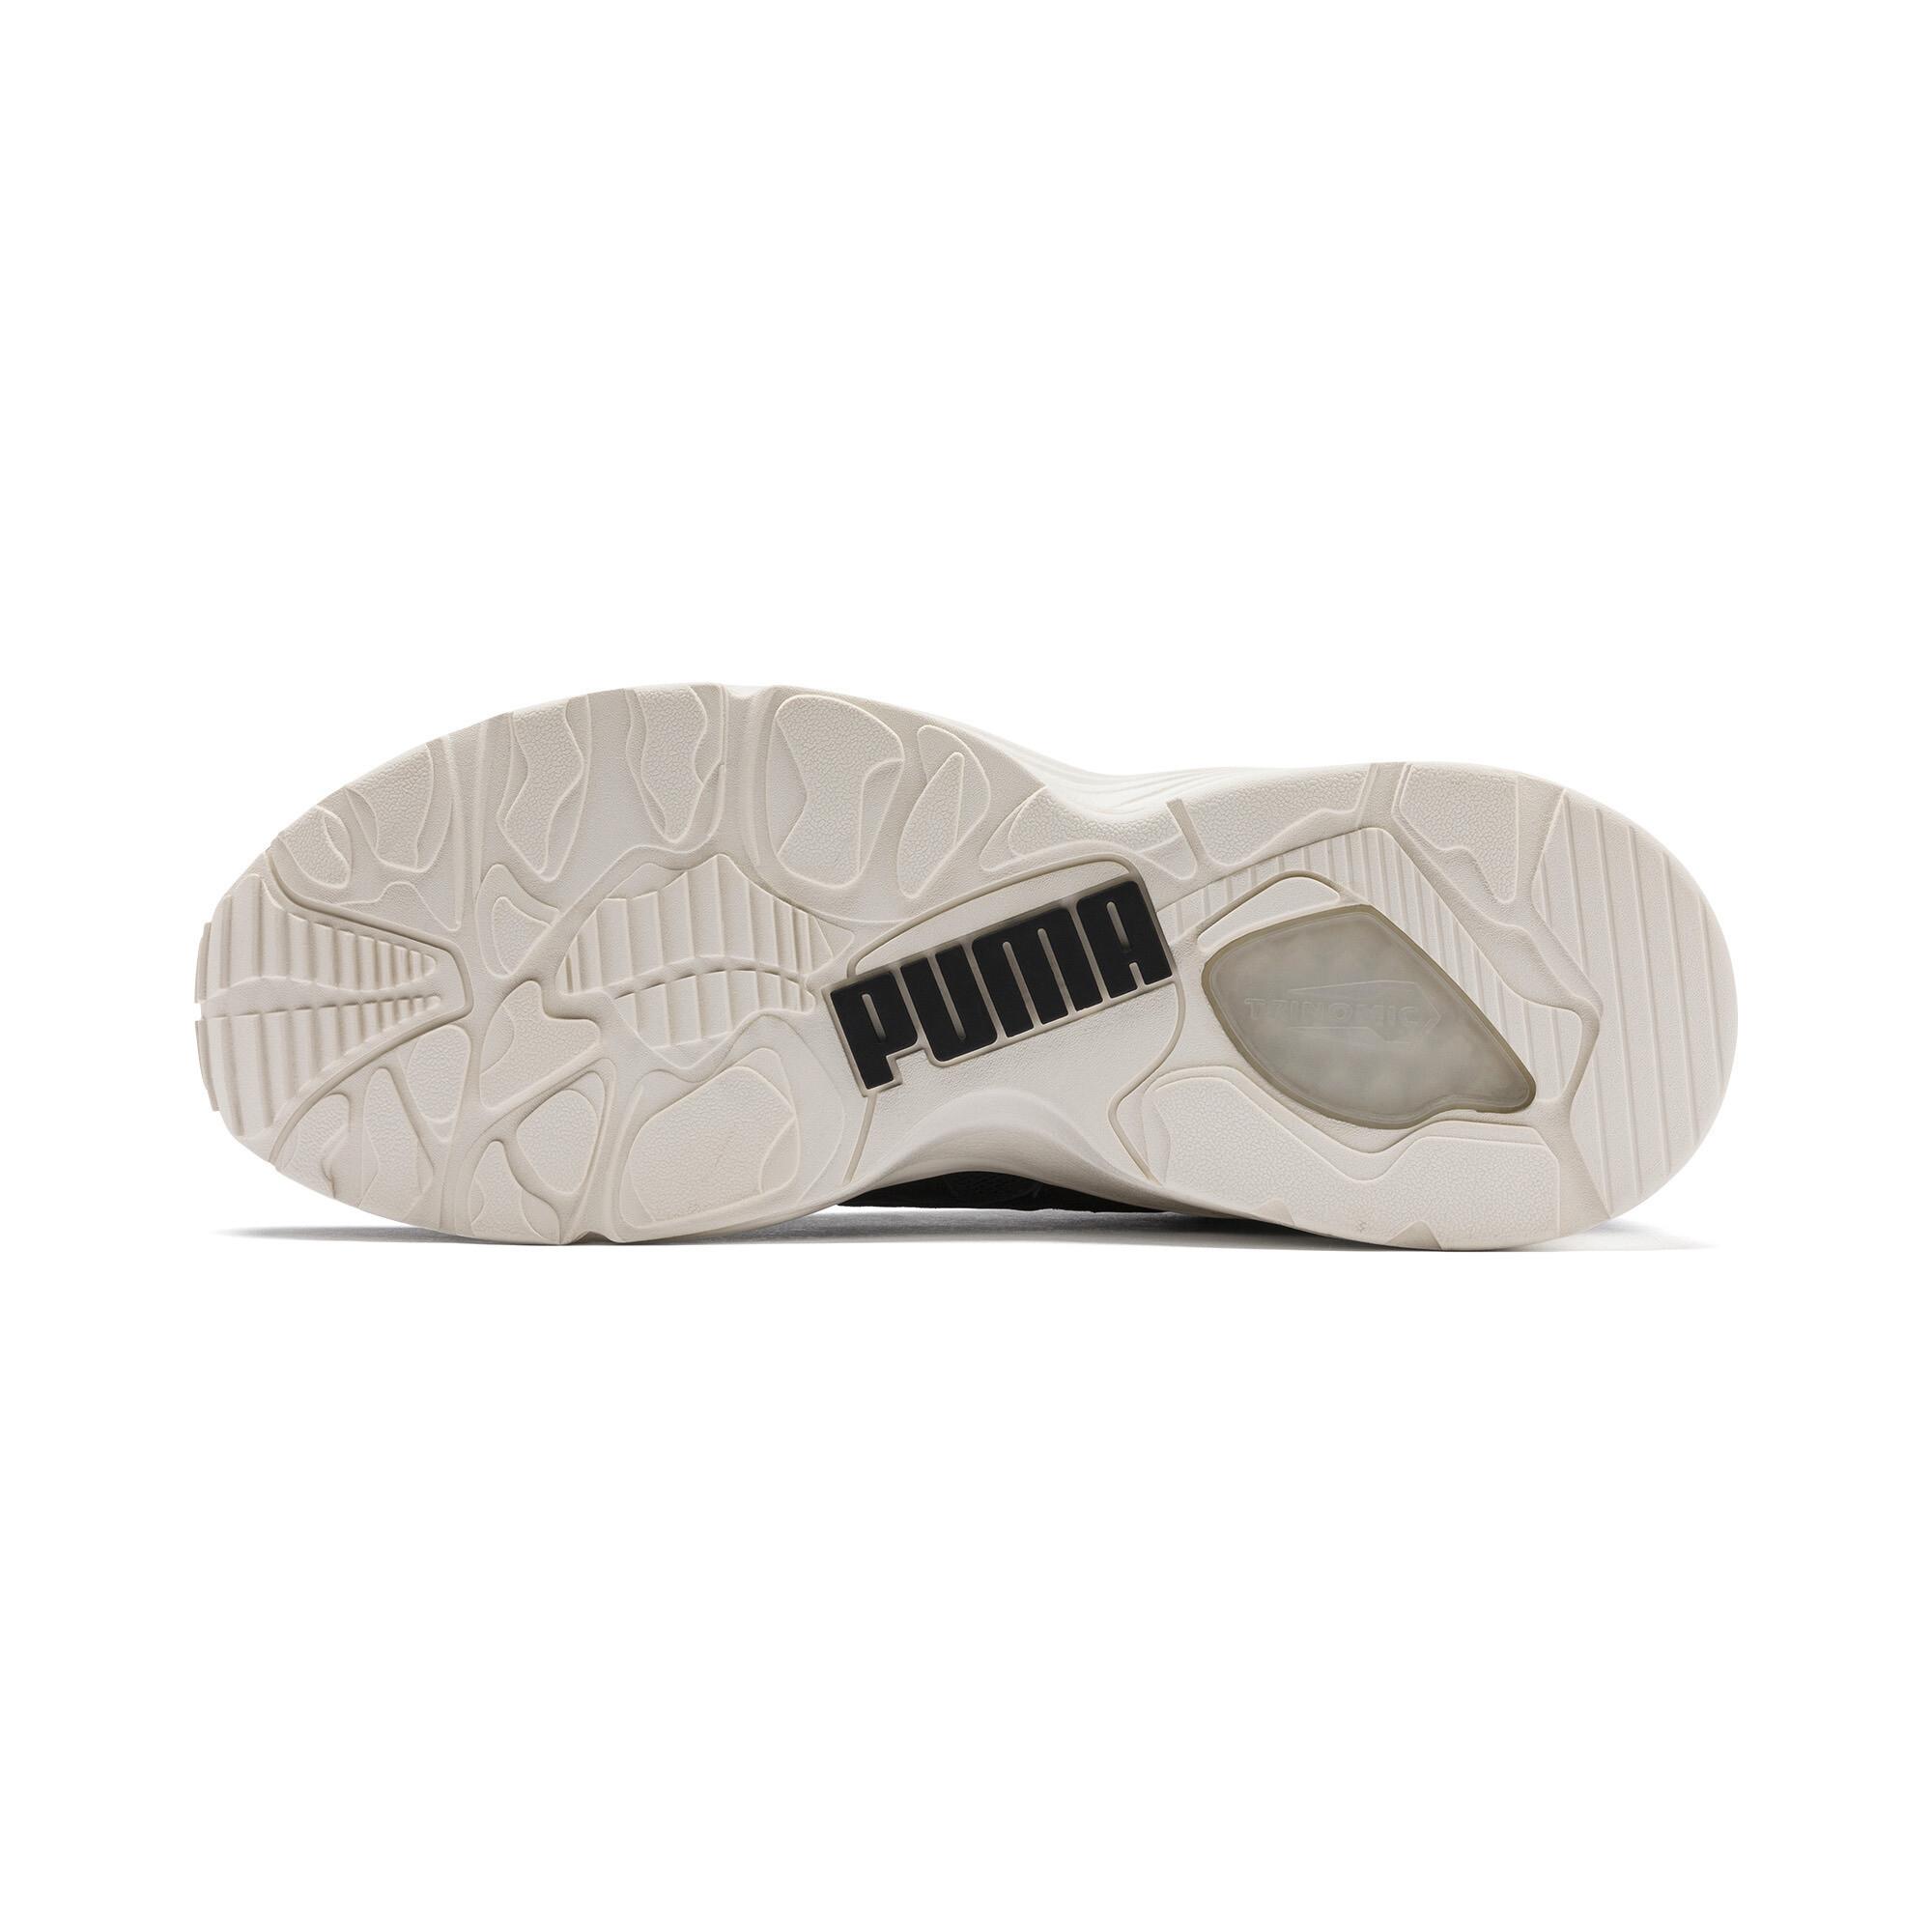 PUMA-Prevail-IR-Reality-Sneakers-Unisex-Shoe thumbnail 11